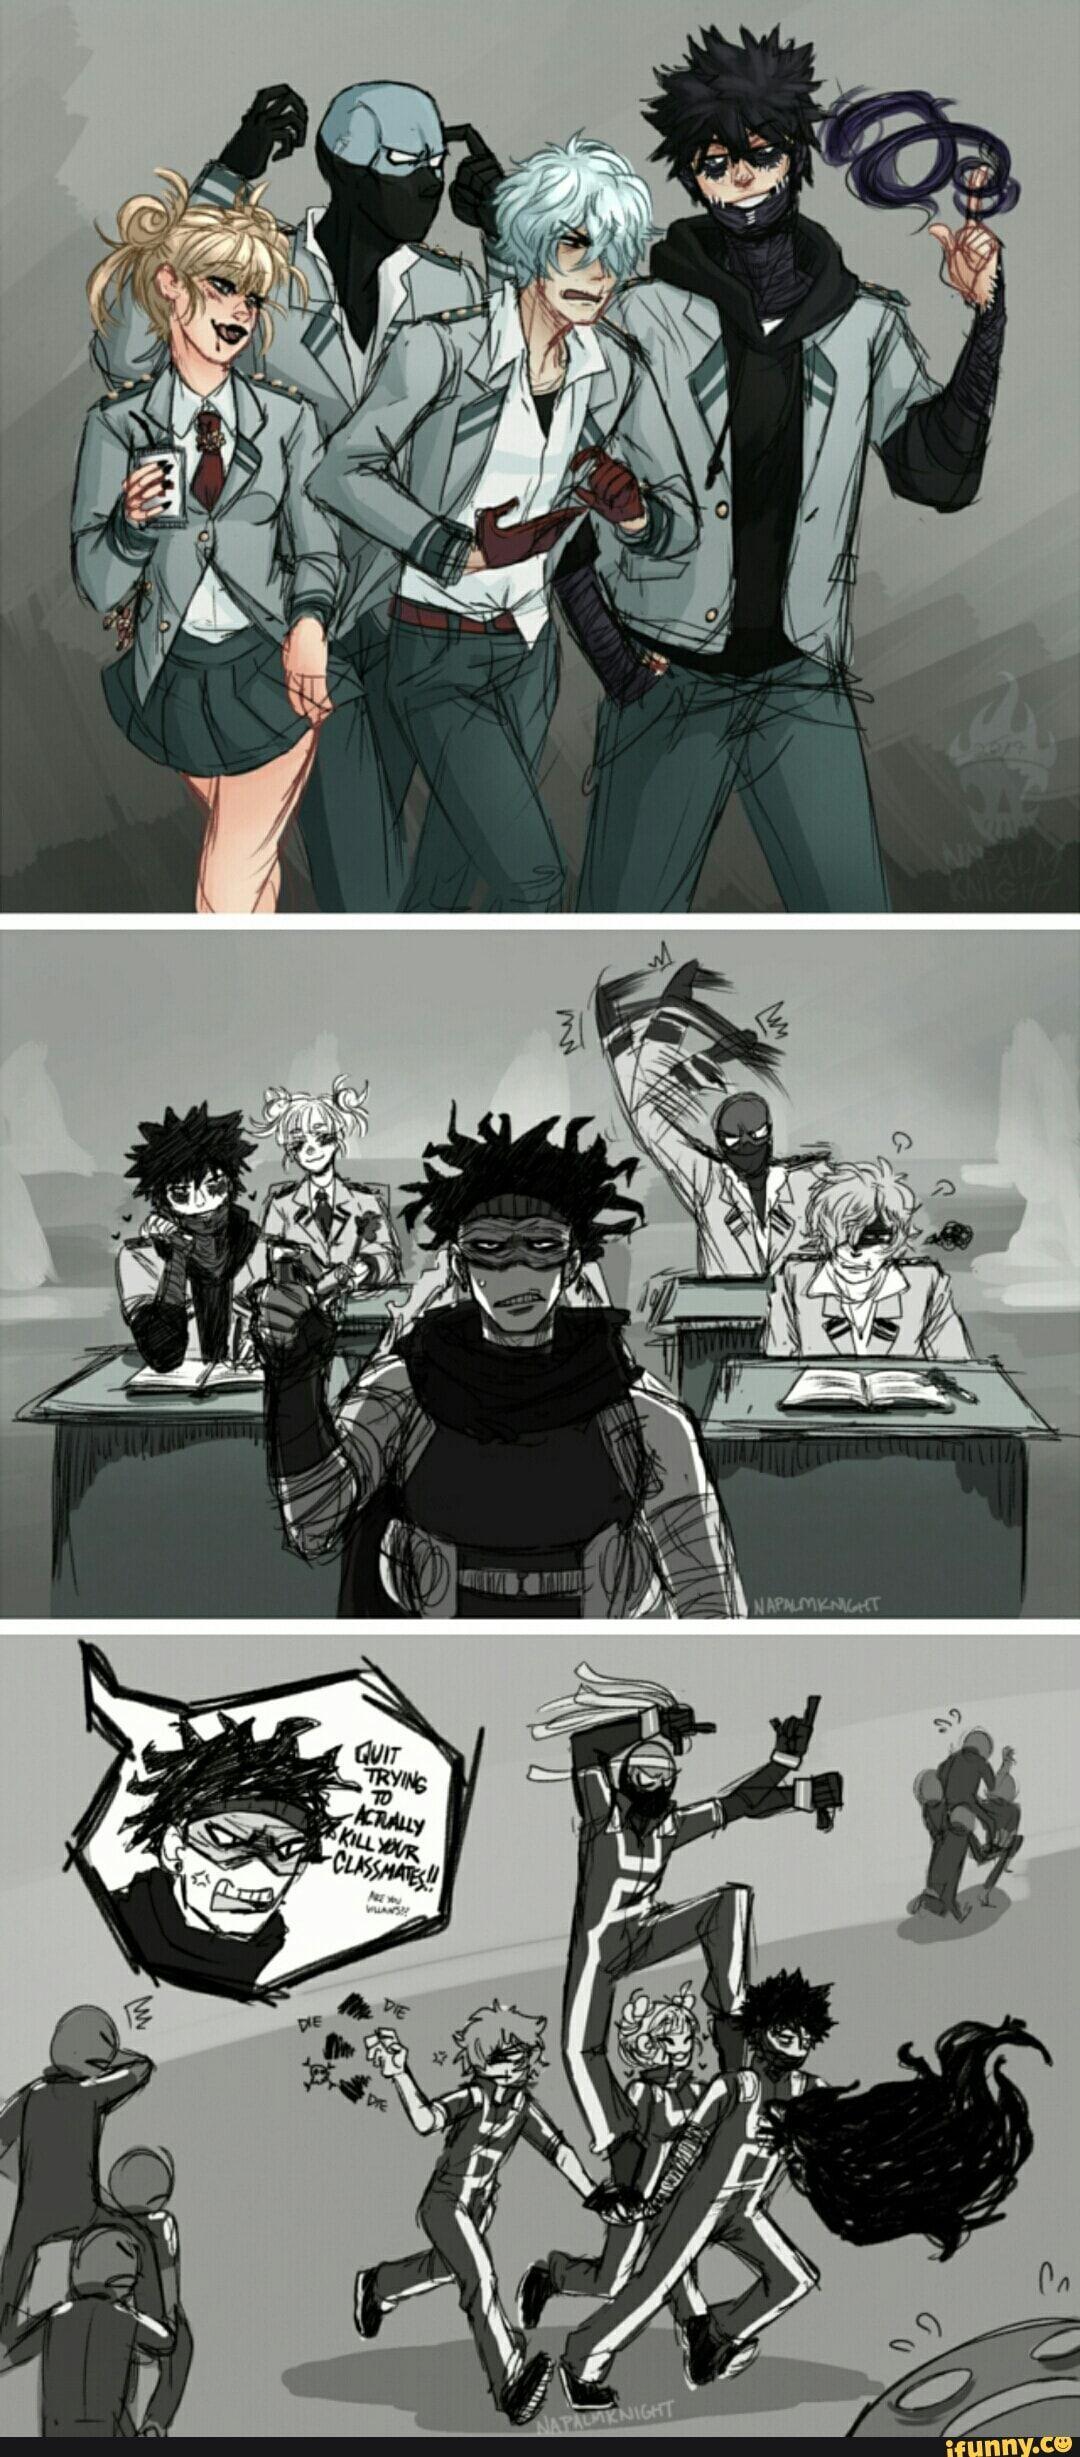 So, Stain Would Be Known As Akaguro Sensei Lol